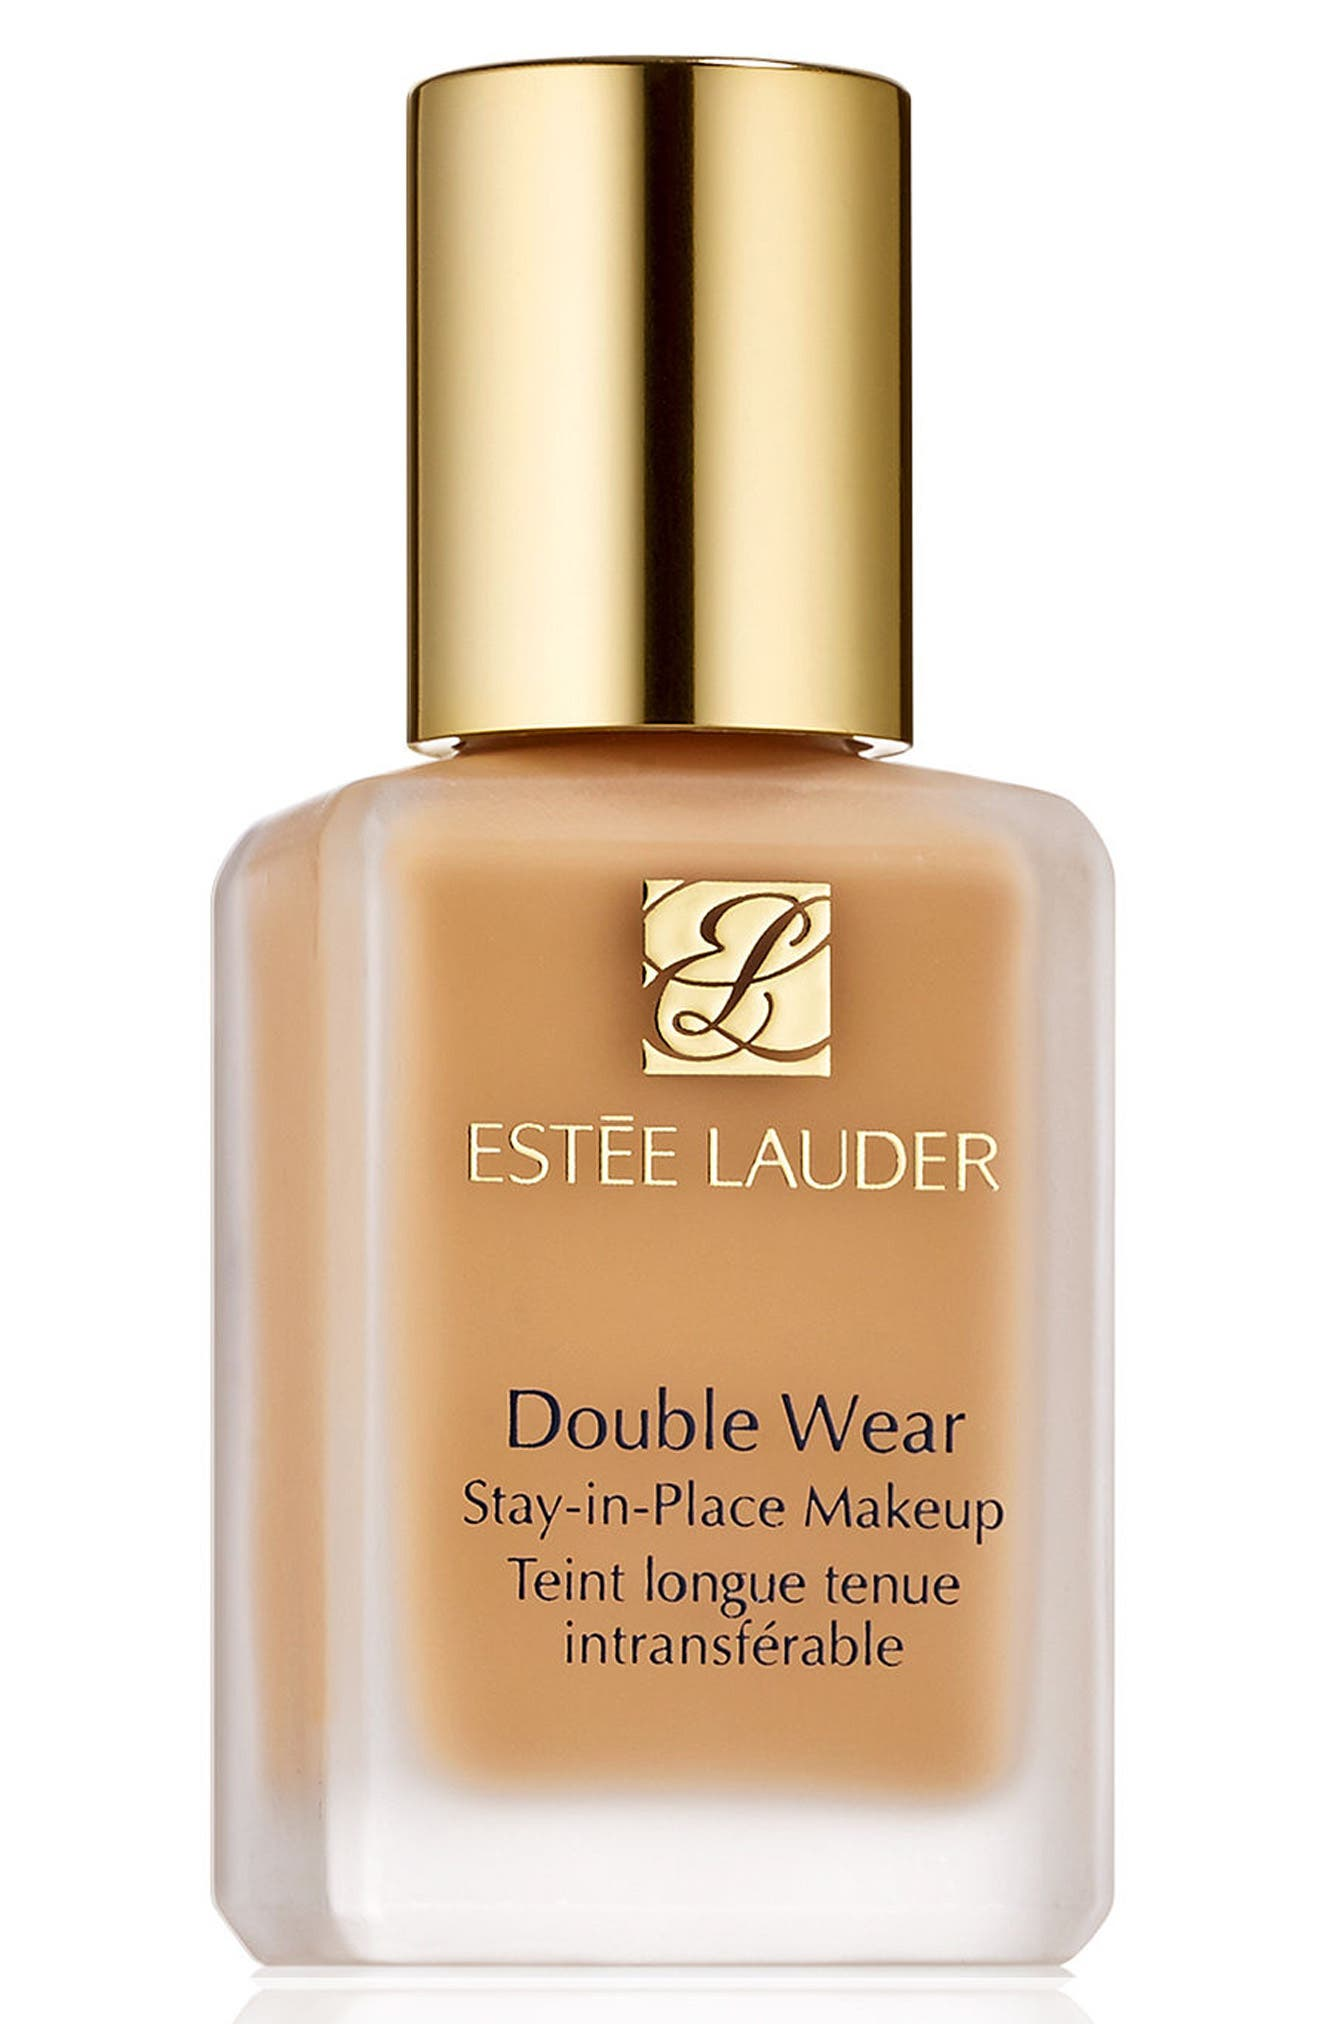 Estee Lauder Double Wear Stay-In-Place Liquid Makeup - 1 Dawn